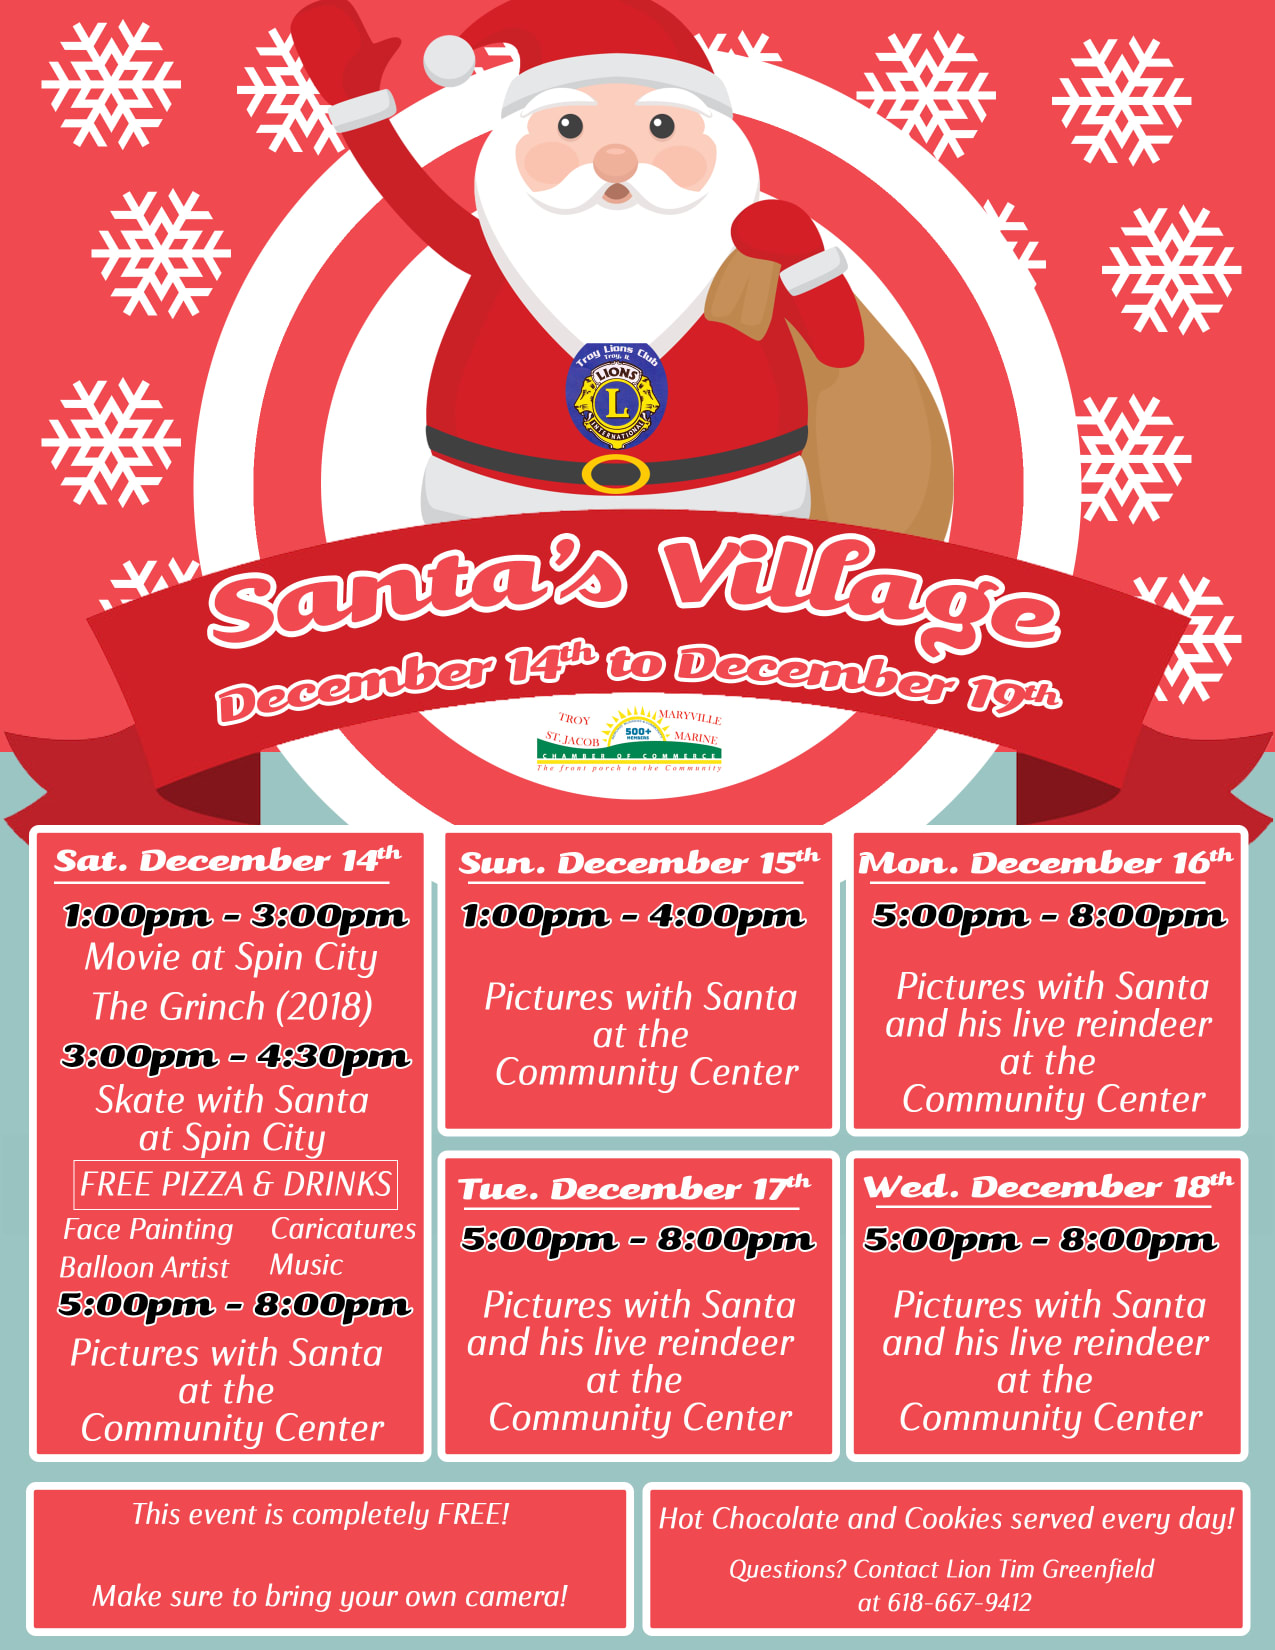 Santa's-Village-Flyer-w1275.jpg